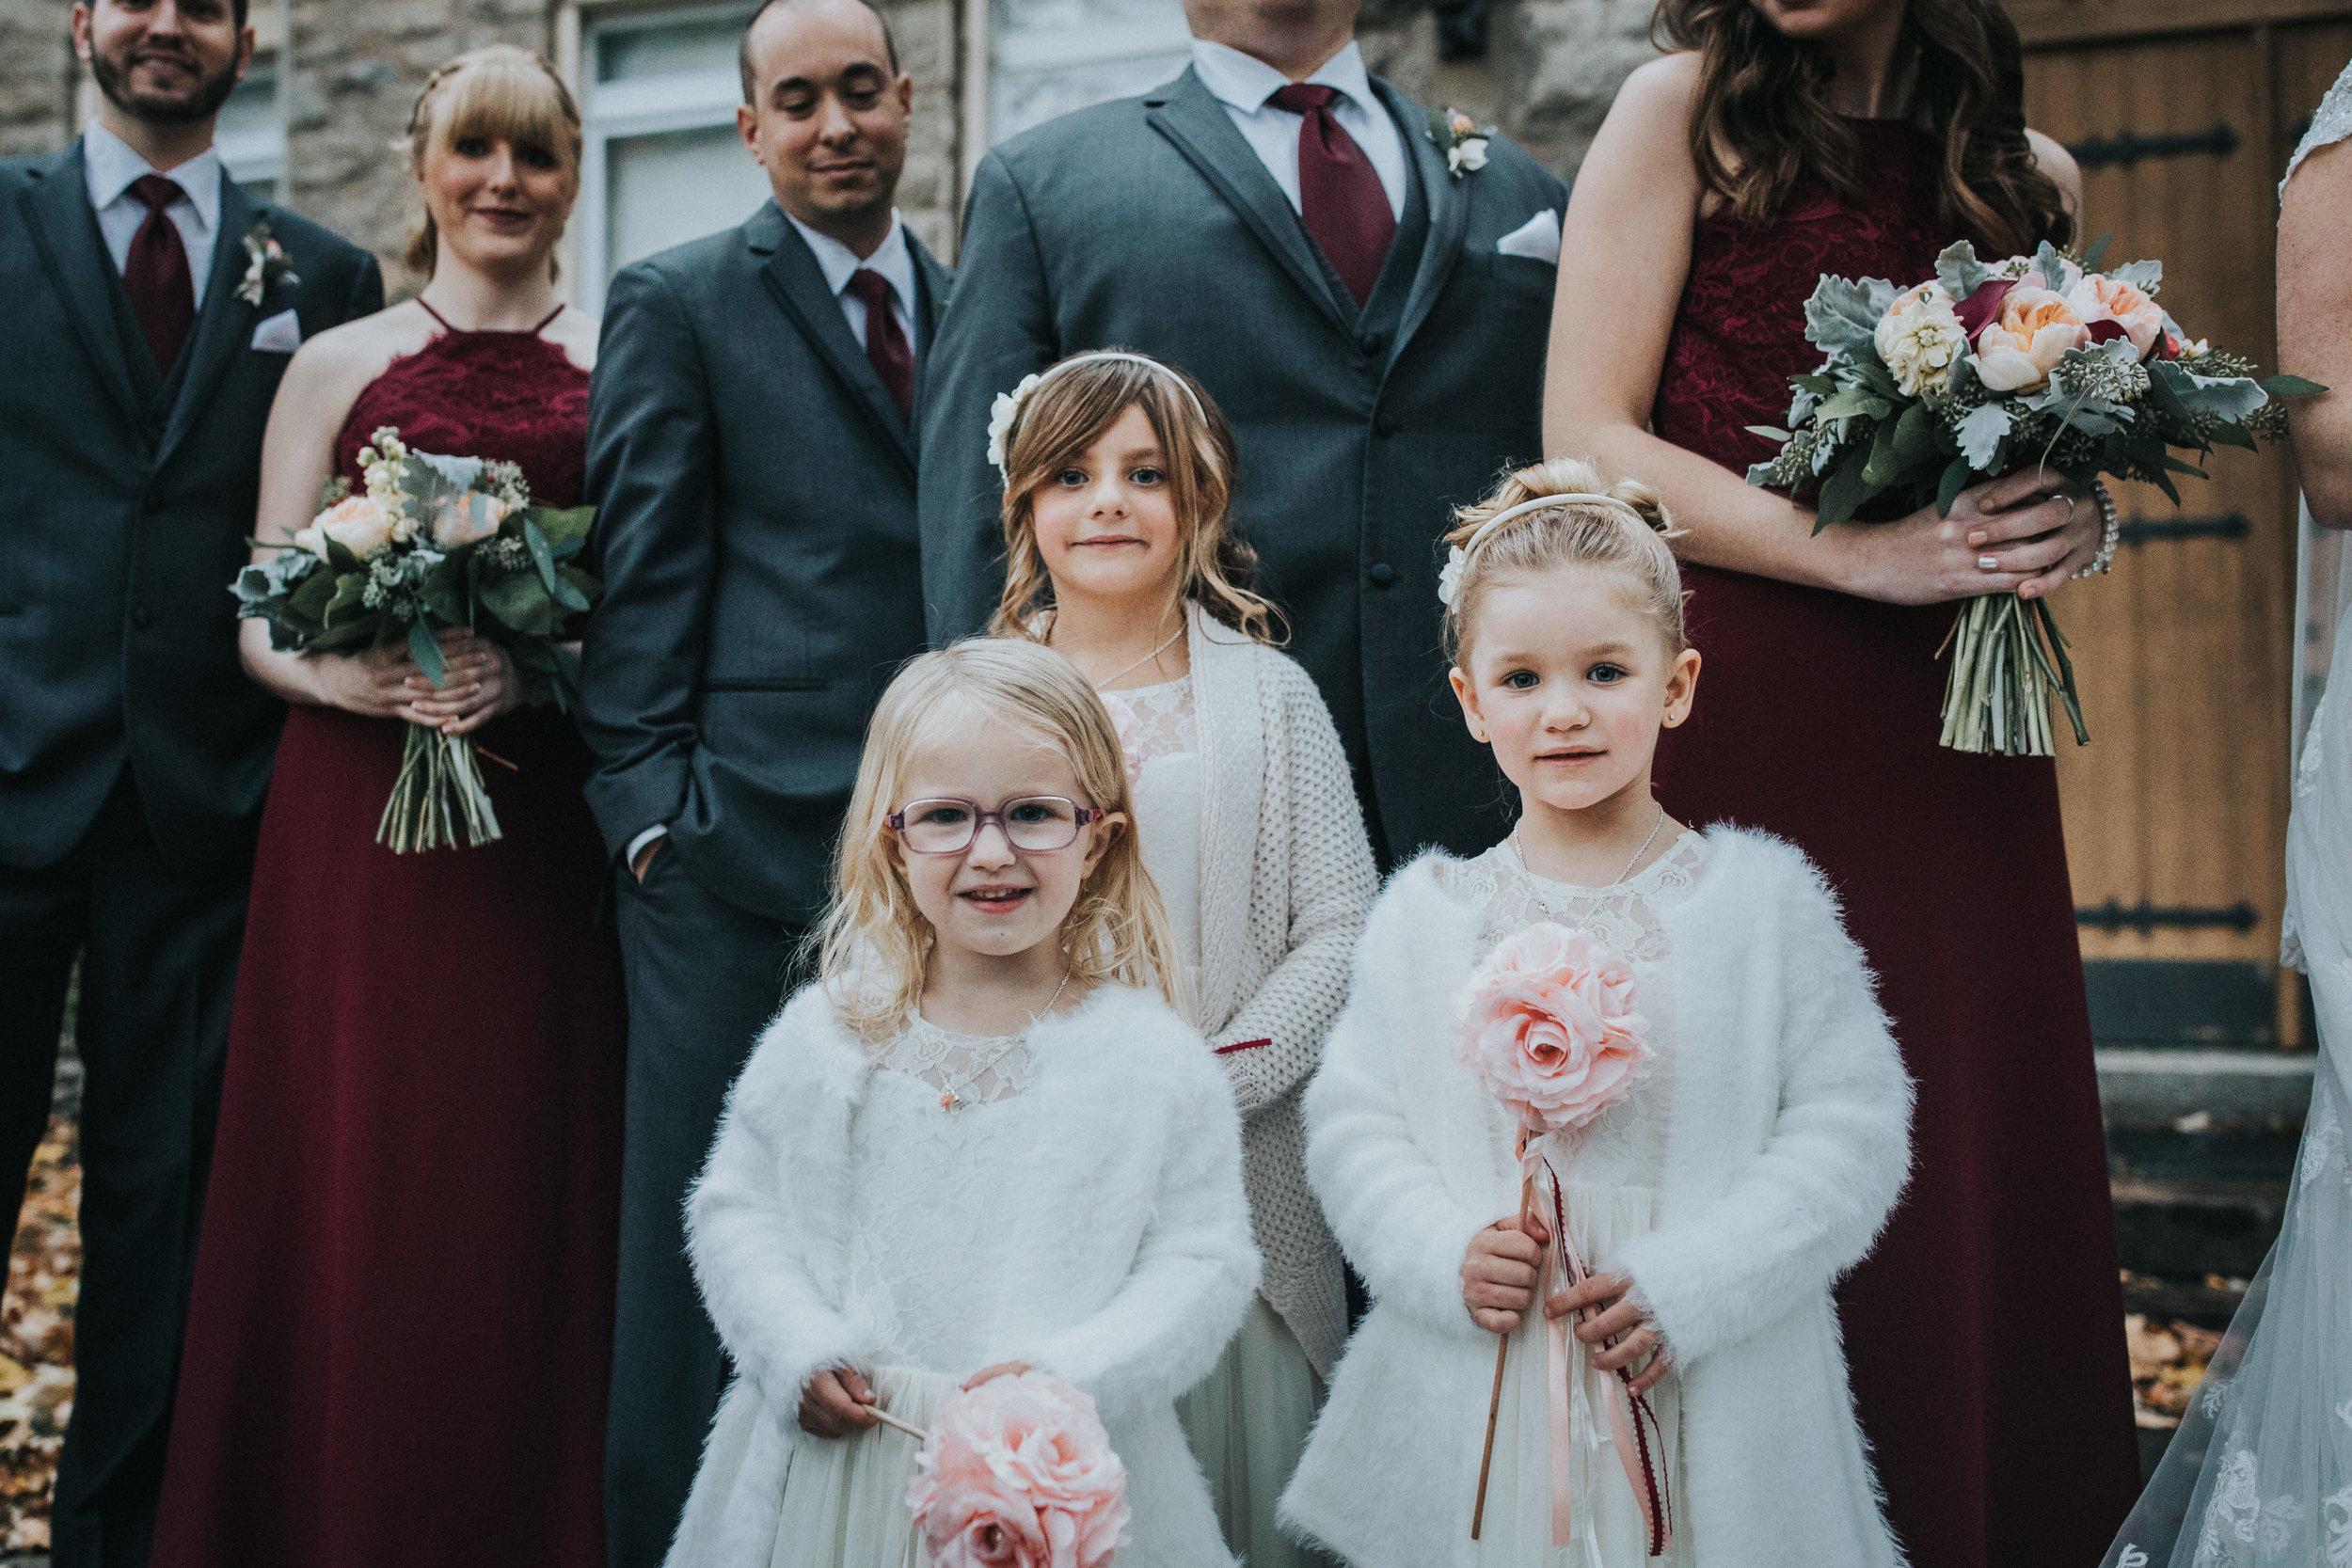 New-Jersey-Wedding-Photography-Fishers-Tudor-House-JennaLynnPhotography-BridalParty-Kathleen&Eddie-8.jpg